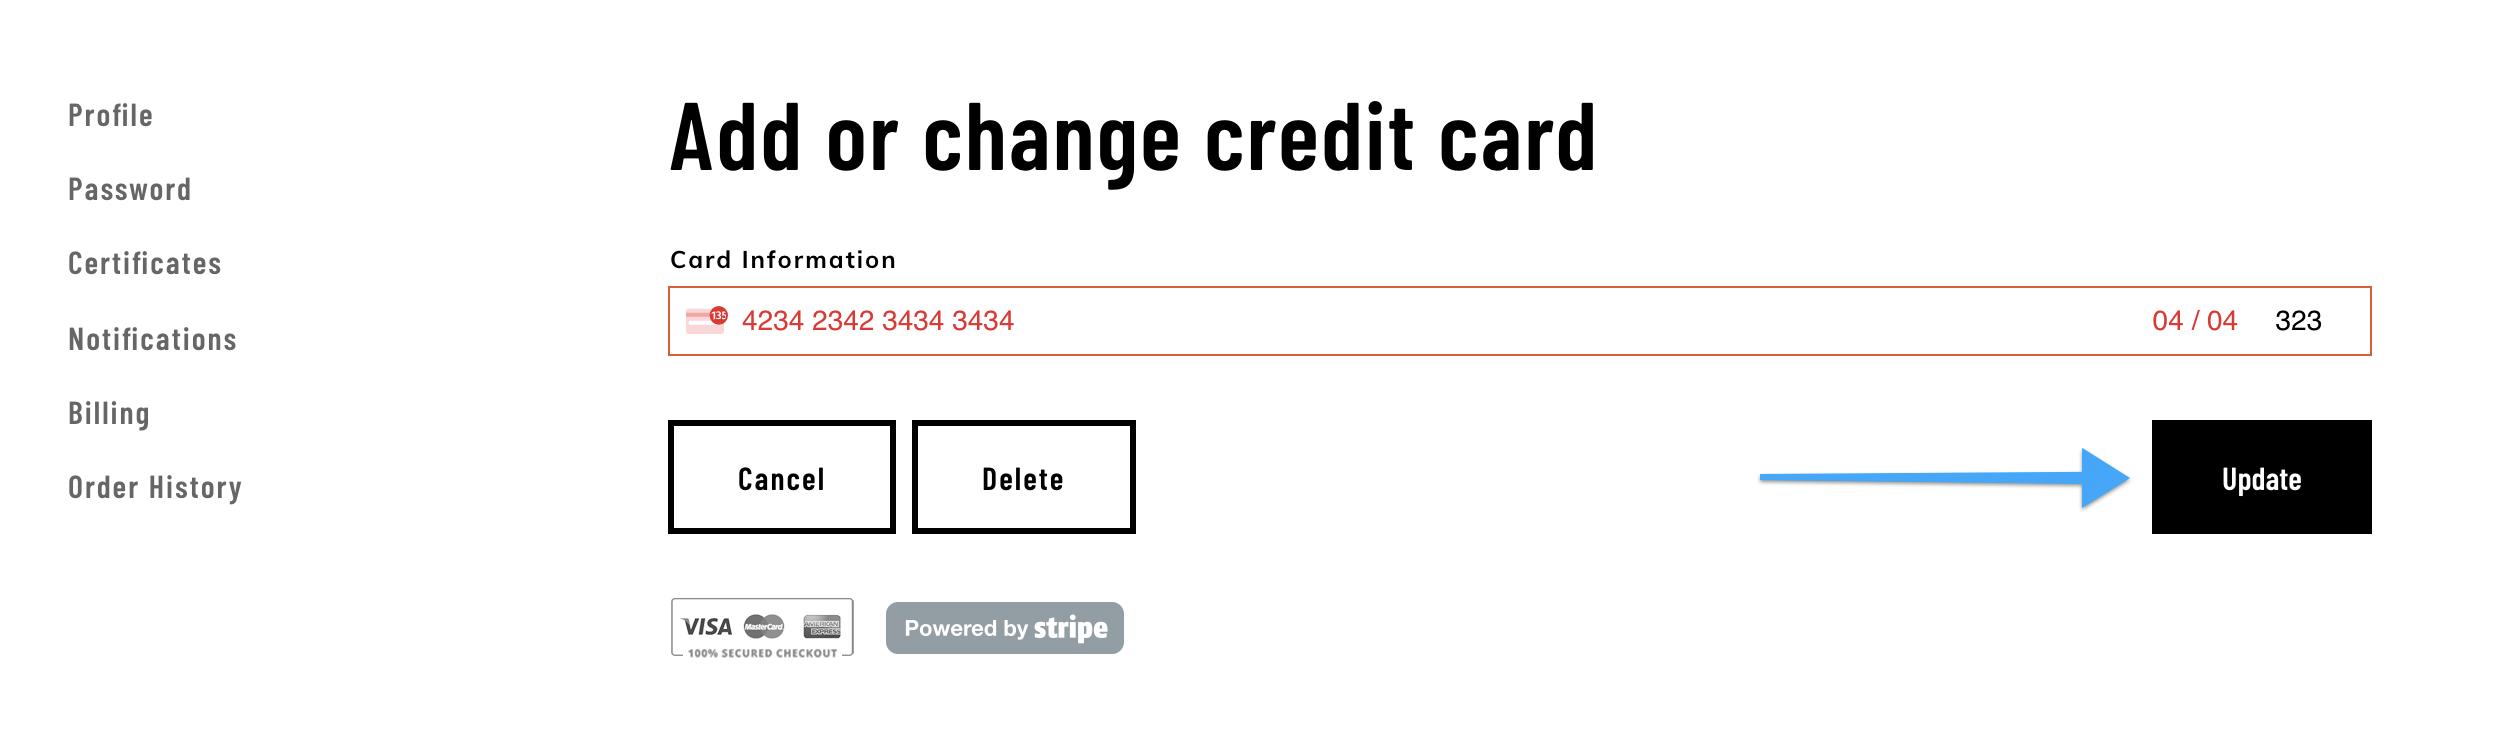 Description: https://s3.amazonaws.com/thinkific/file_uploads/237820/images/570/7b8/9b1/add_change_delete_credit_card.png